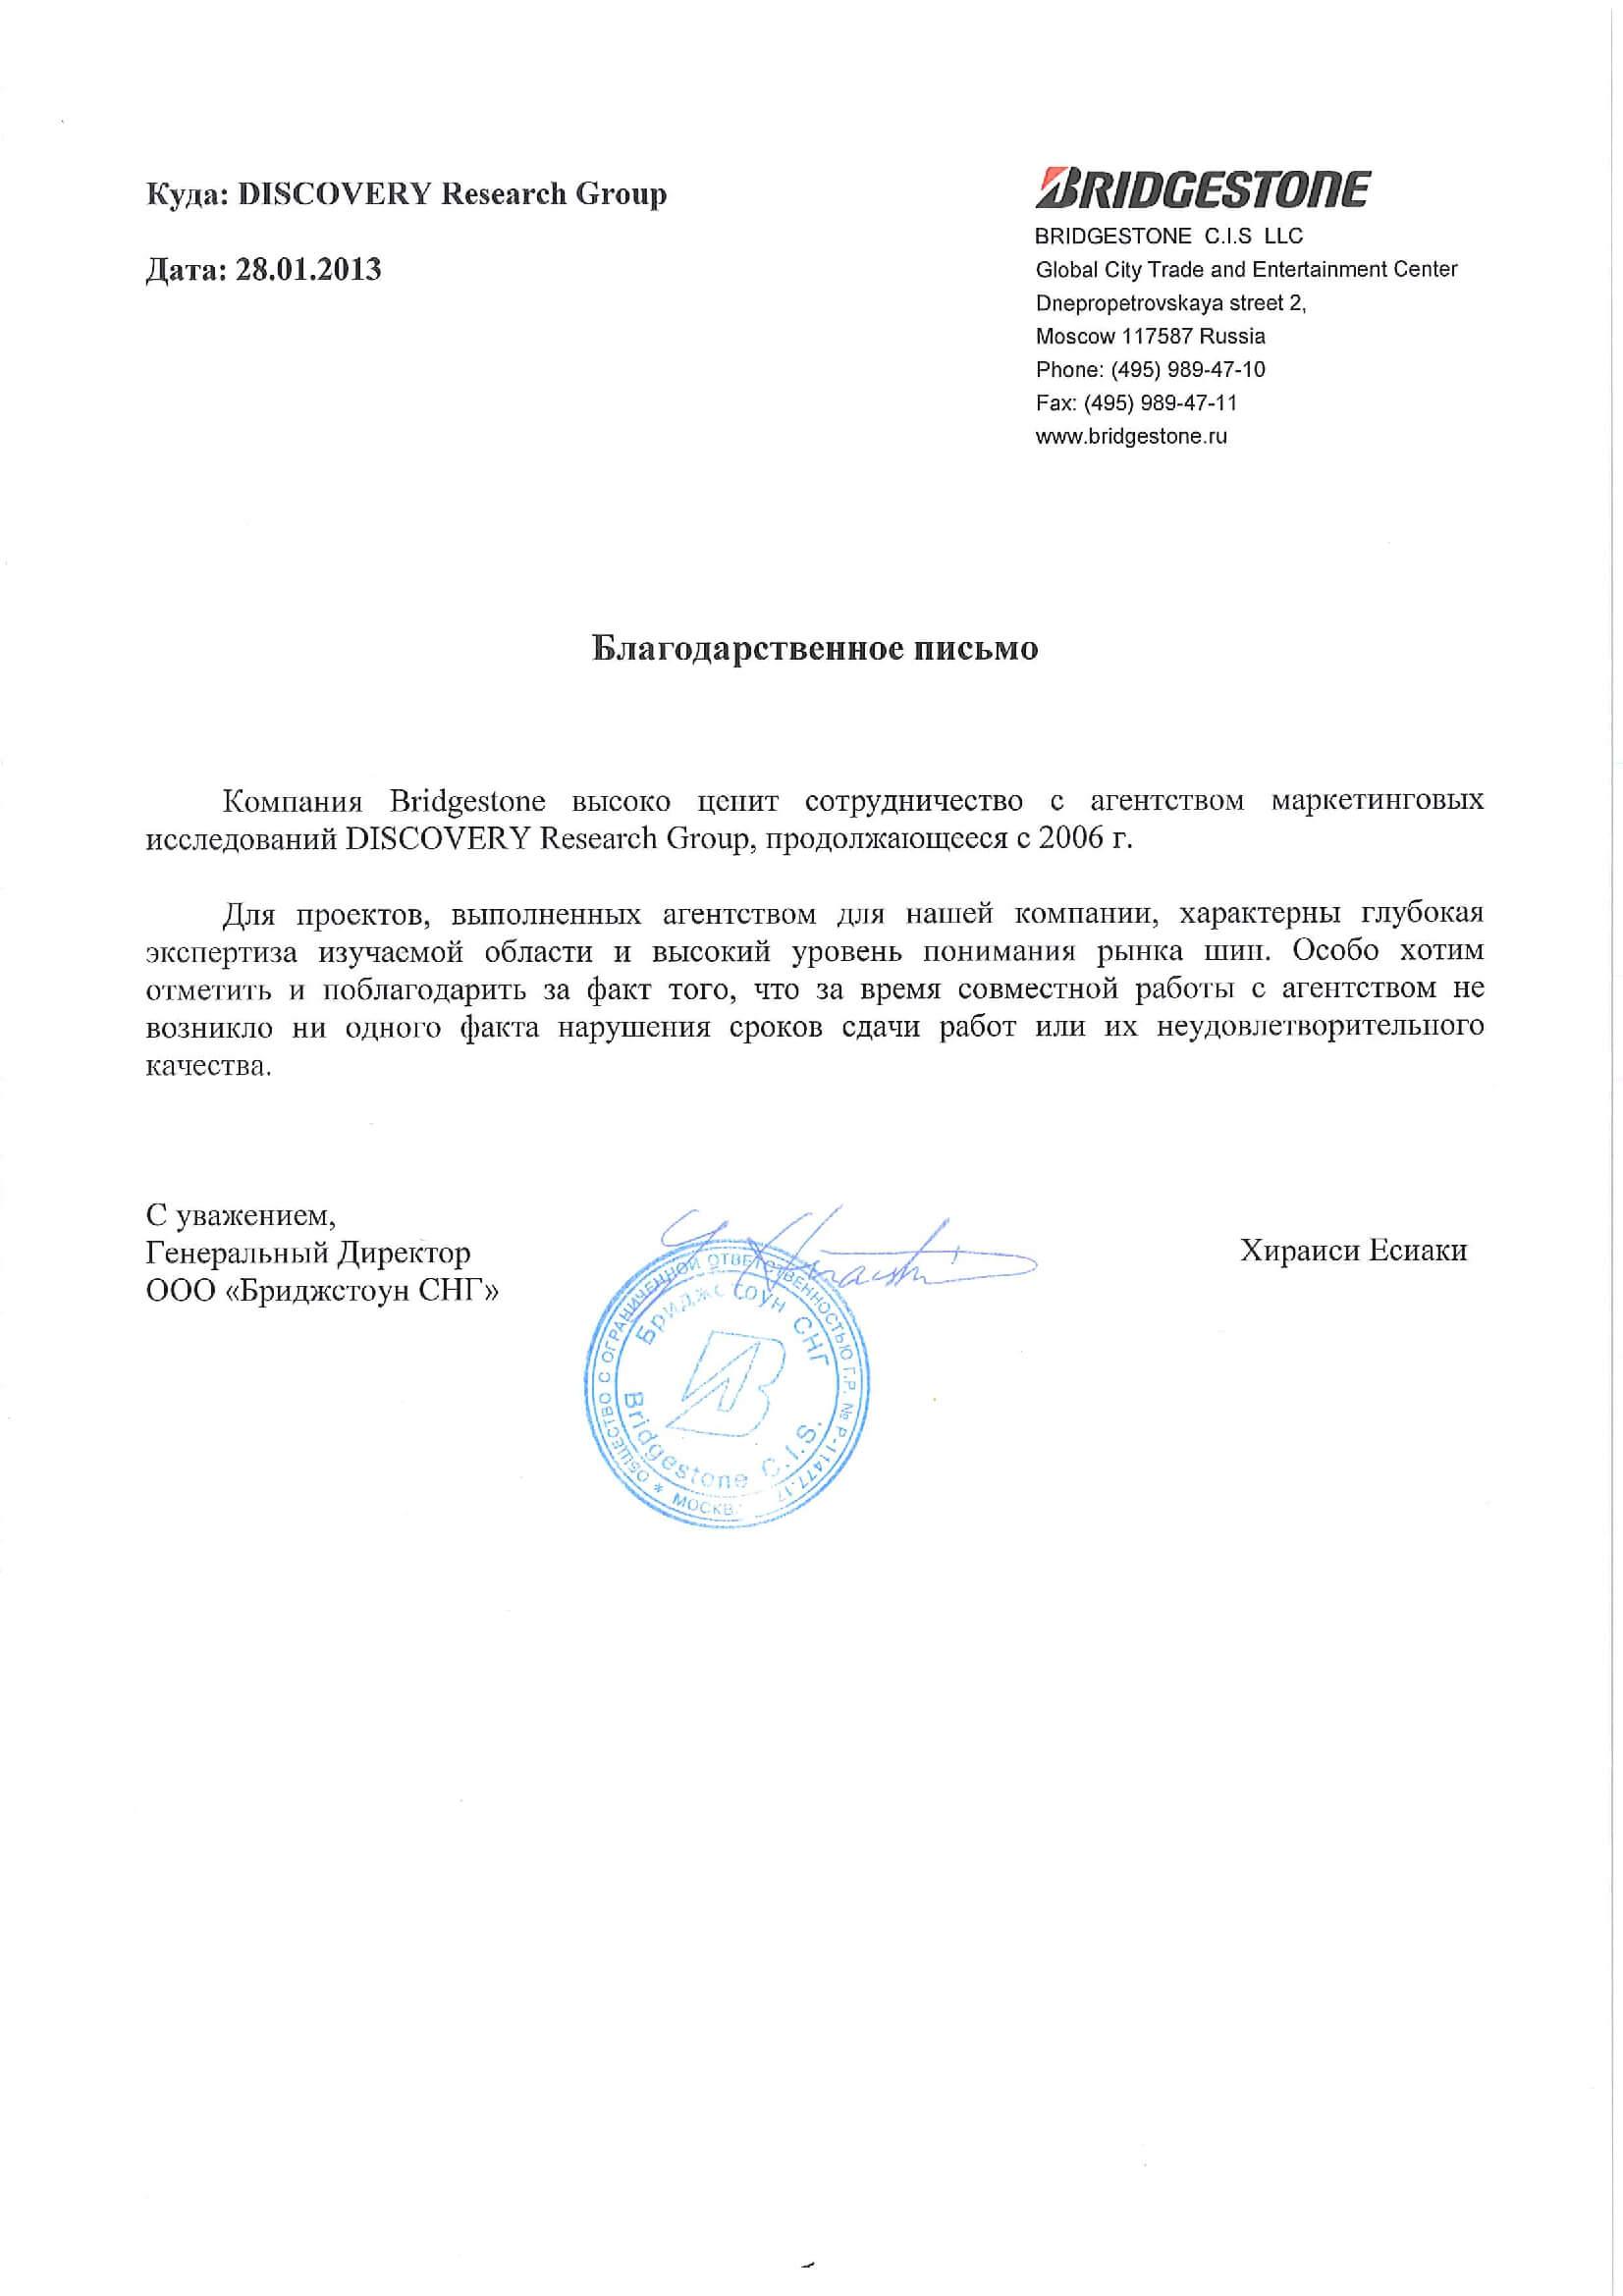 http://drgroup.ru/images/otzivi/Ridgestone.jpg